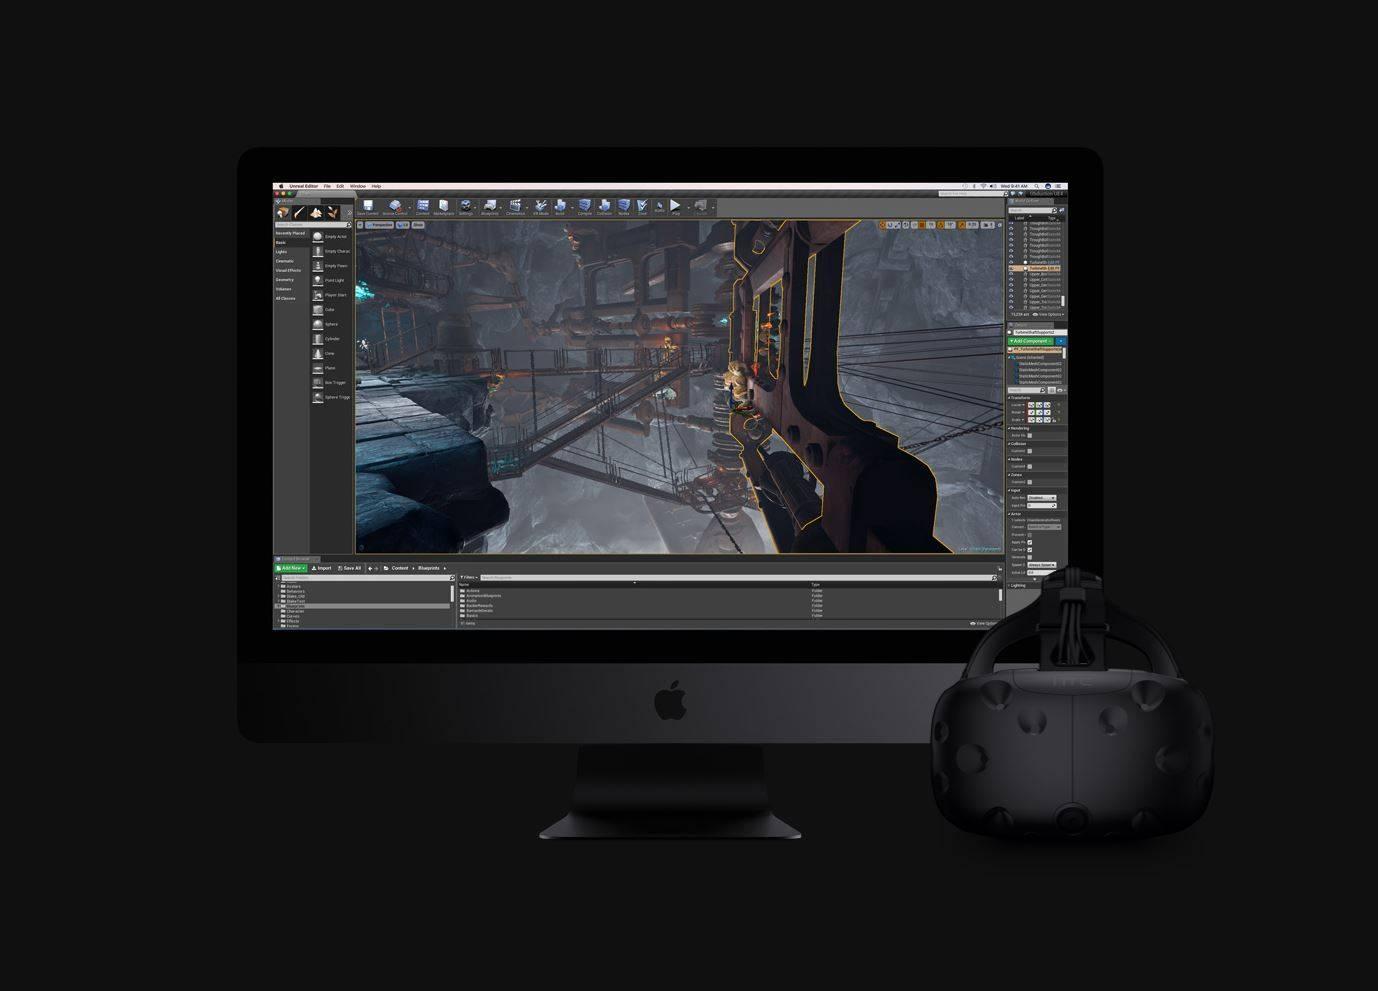 iMac Pro HTC vive VR PingWest Hao Ying 2